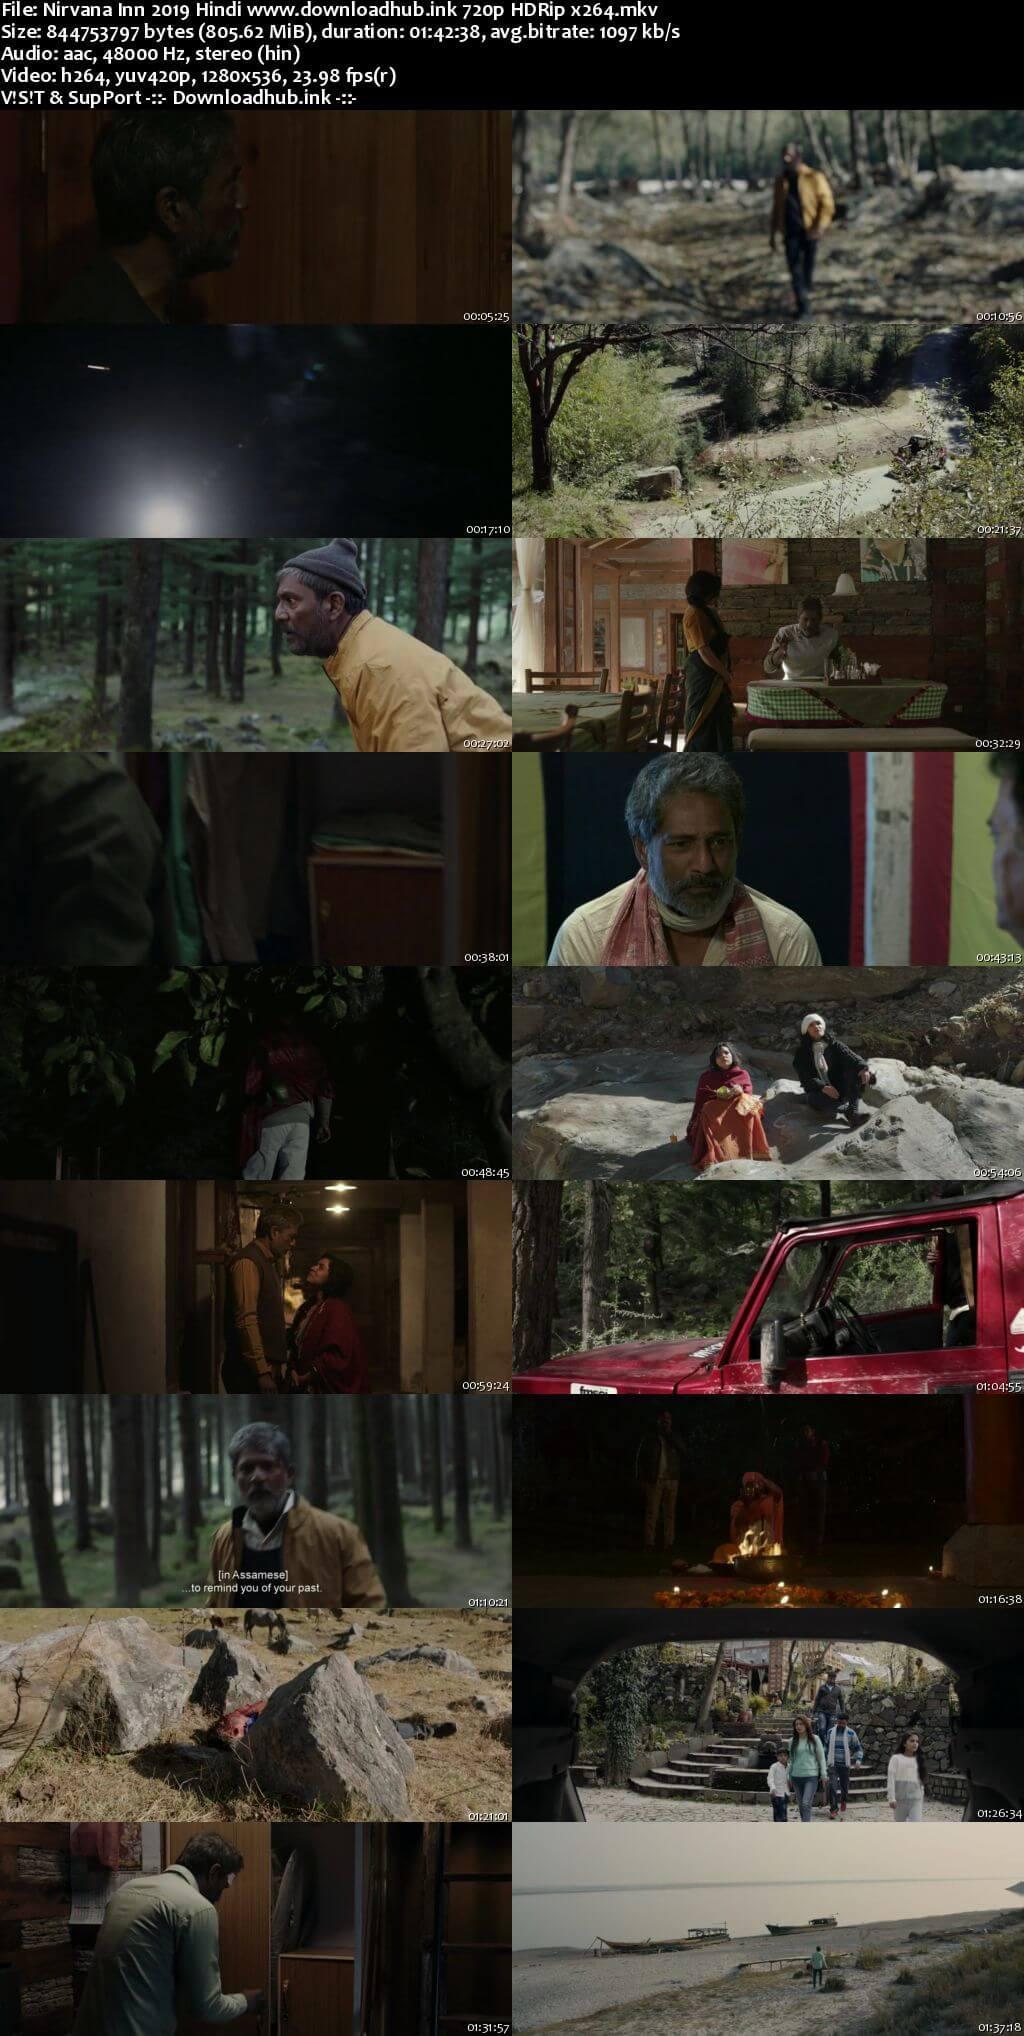 Nirvana Inn 2019 Hindi 720p HDRip x264